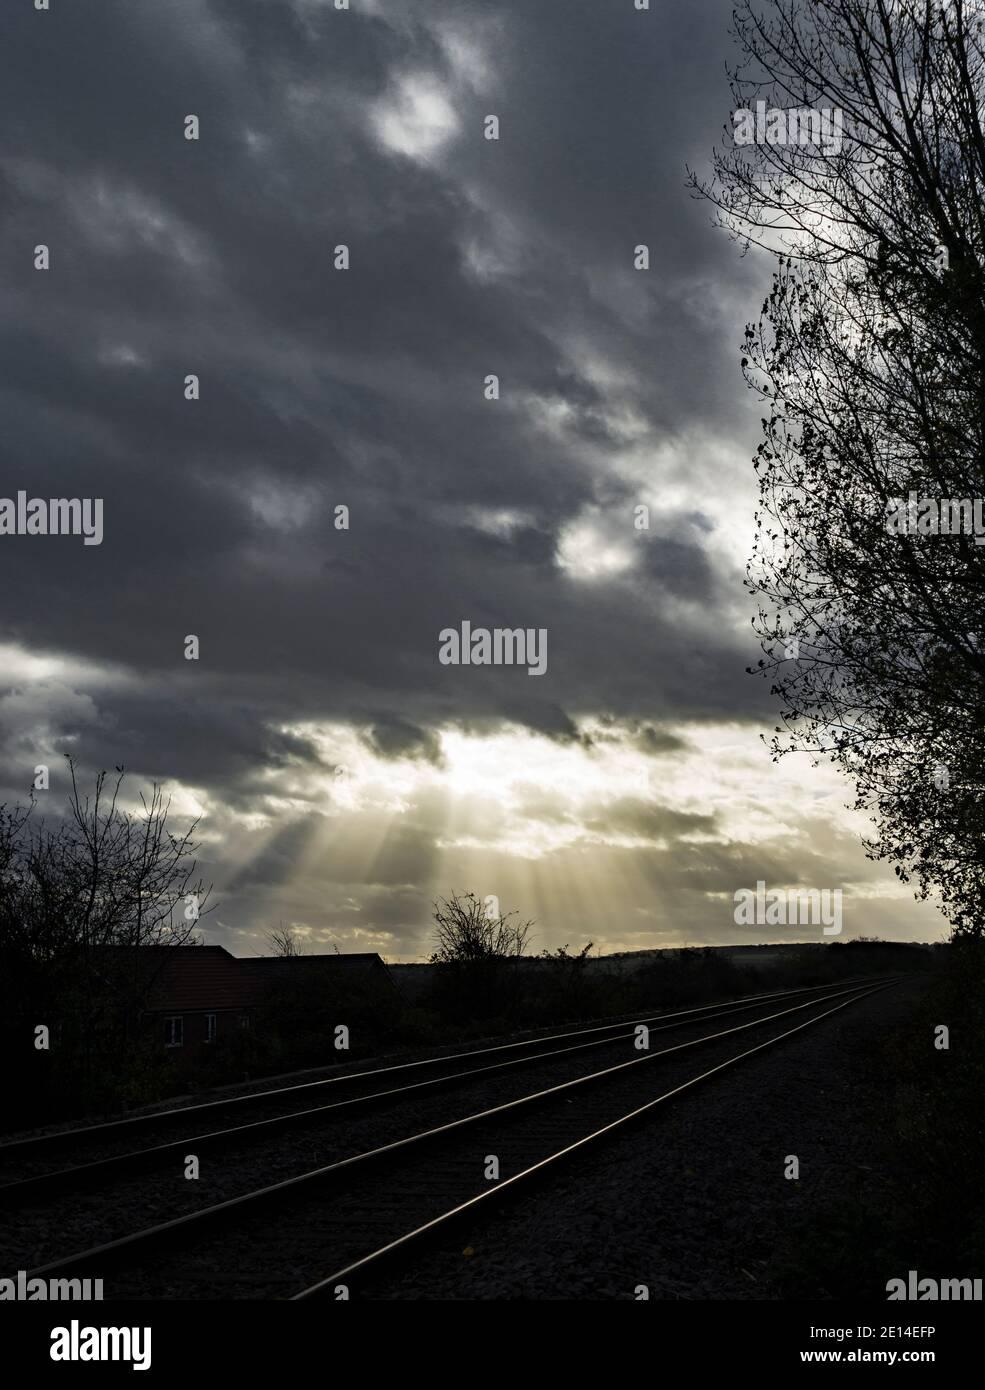 suns-rays-penetrating-clouds-2E14EFP.jpg